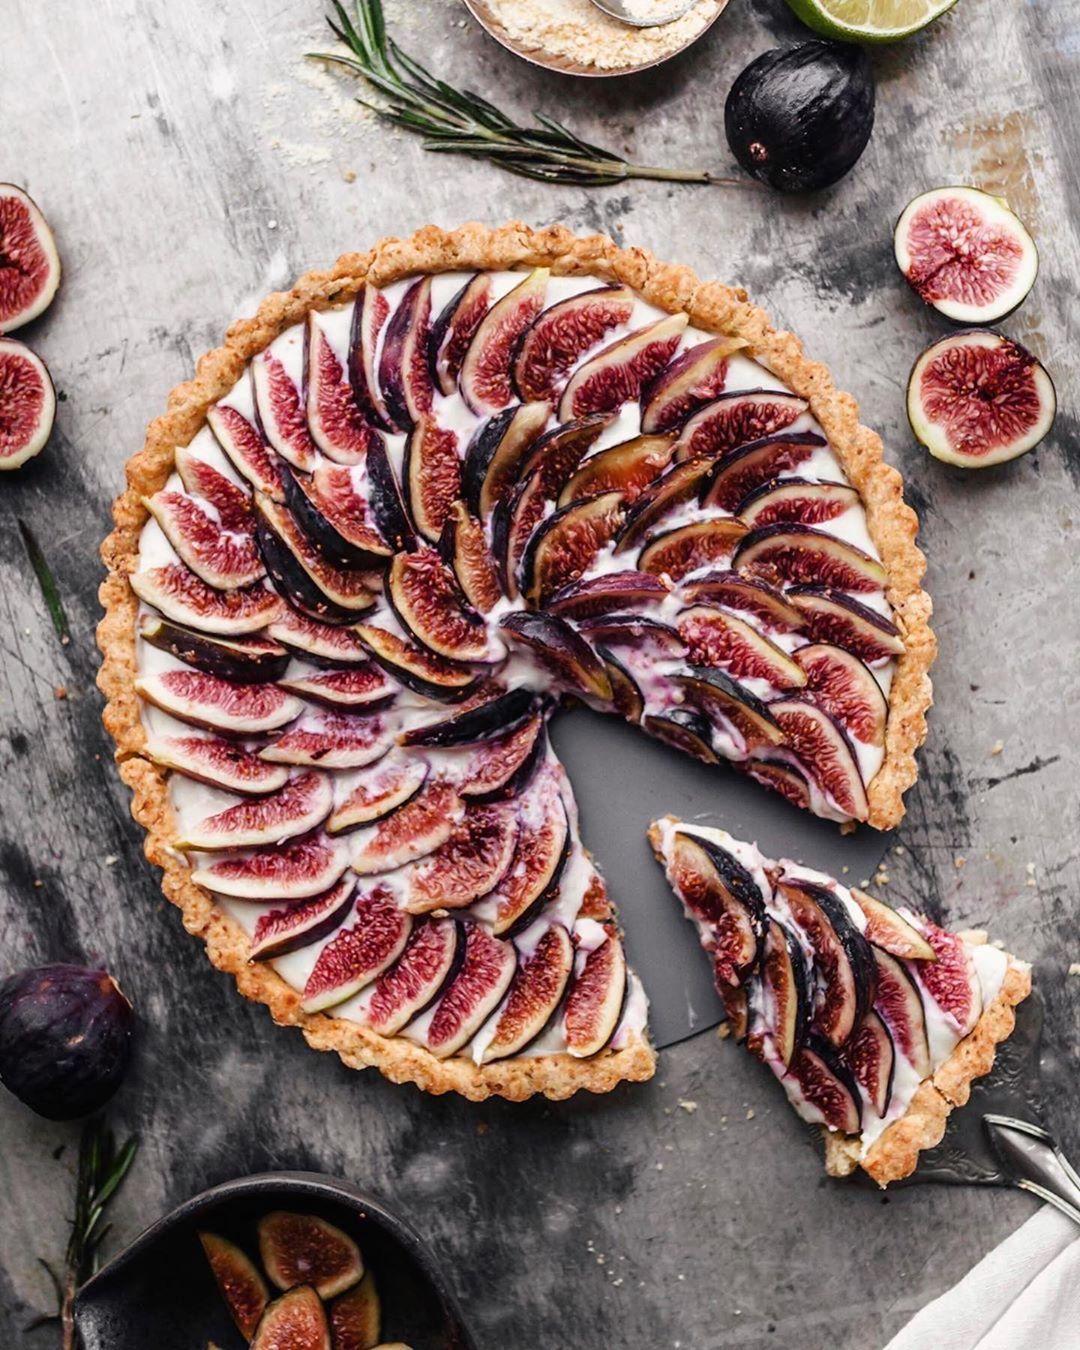 Best Of Vegan On Instagram Vegan Lemon Mascarpone Fig Tart With Rosemary Crust By Hannah Chia Crust 1 1 2 Cups Flour 1 2 In 2020 Fig Tart Food Vegan Desserts